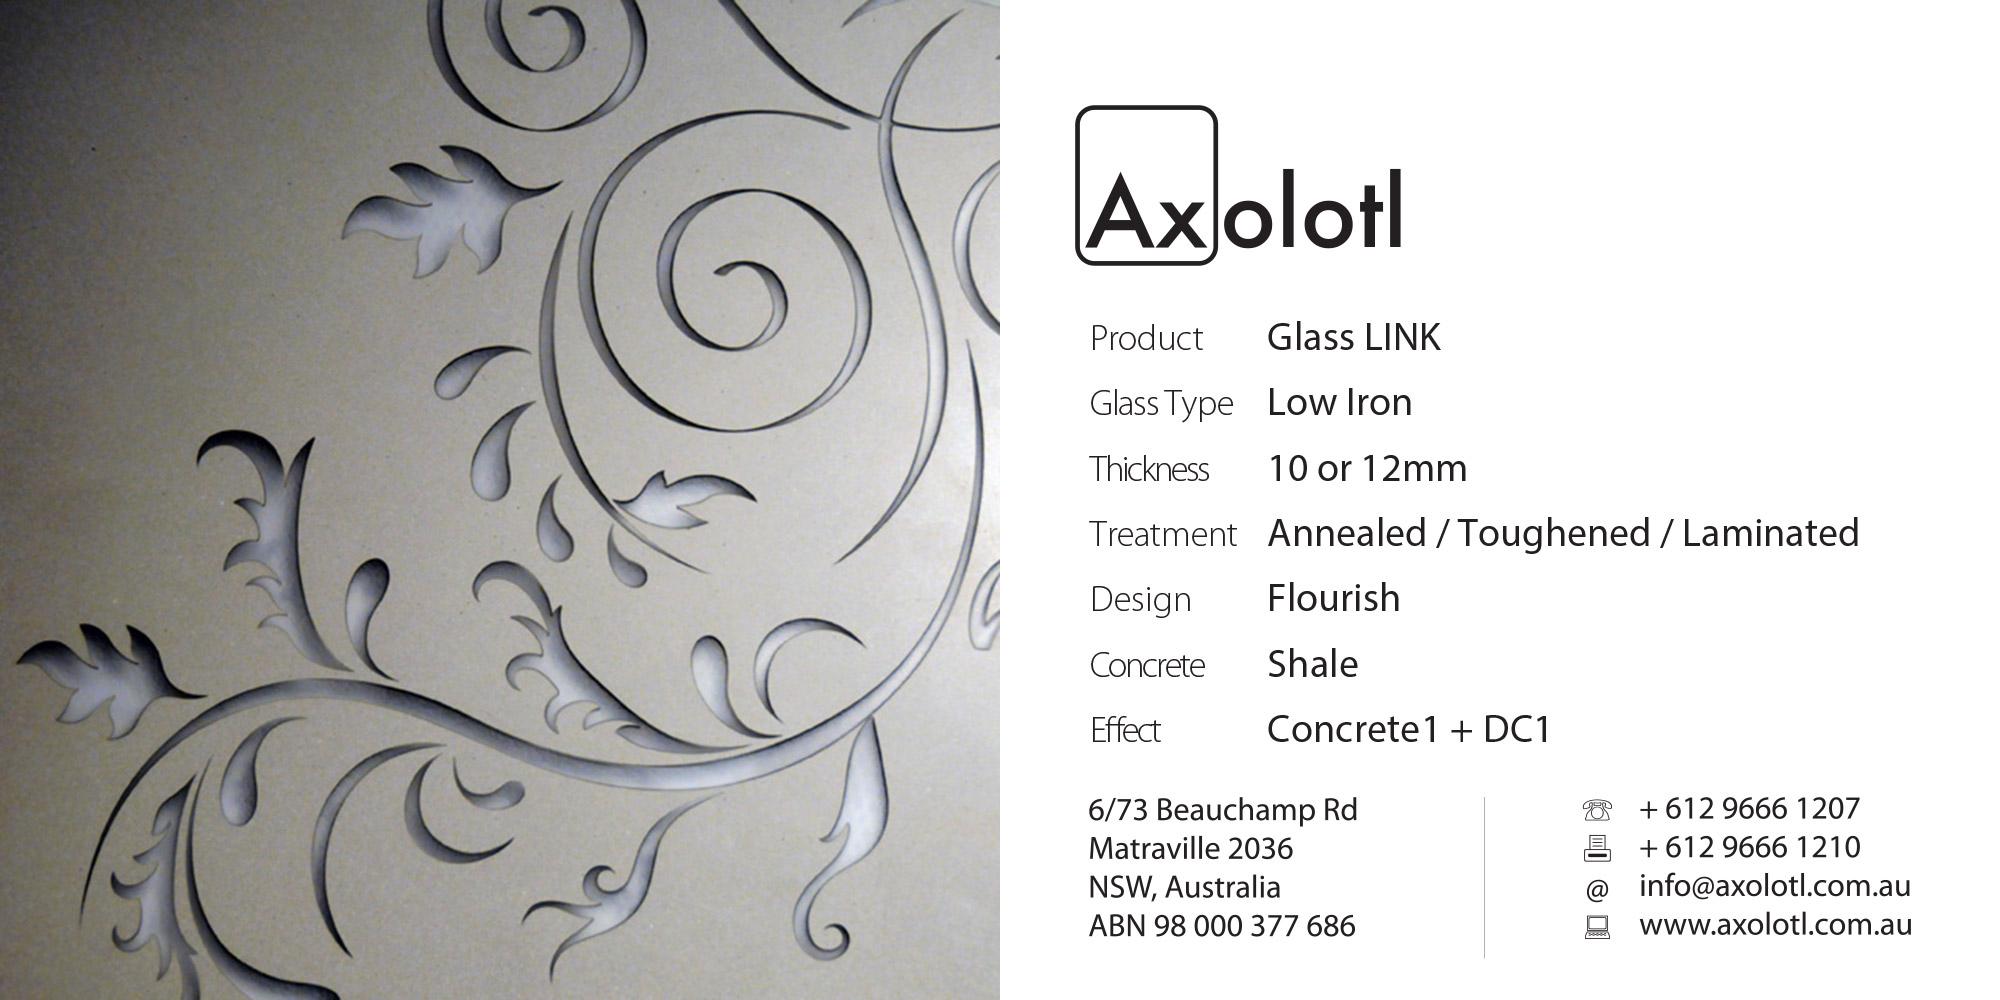 Axoltol_GlassLINK_Flourish_Shale.jpg